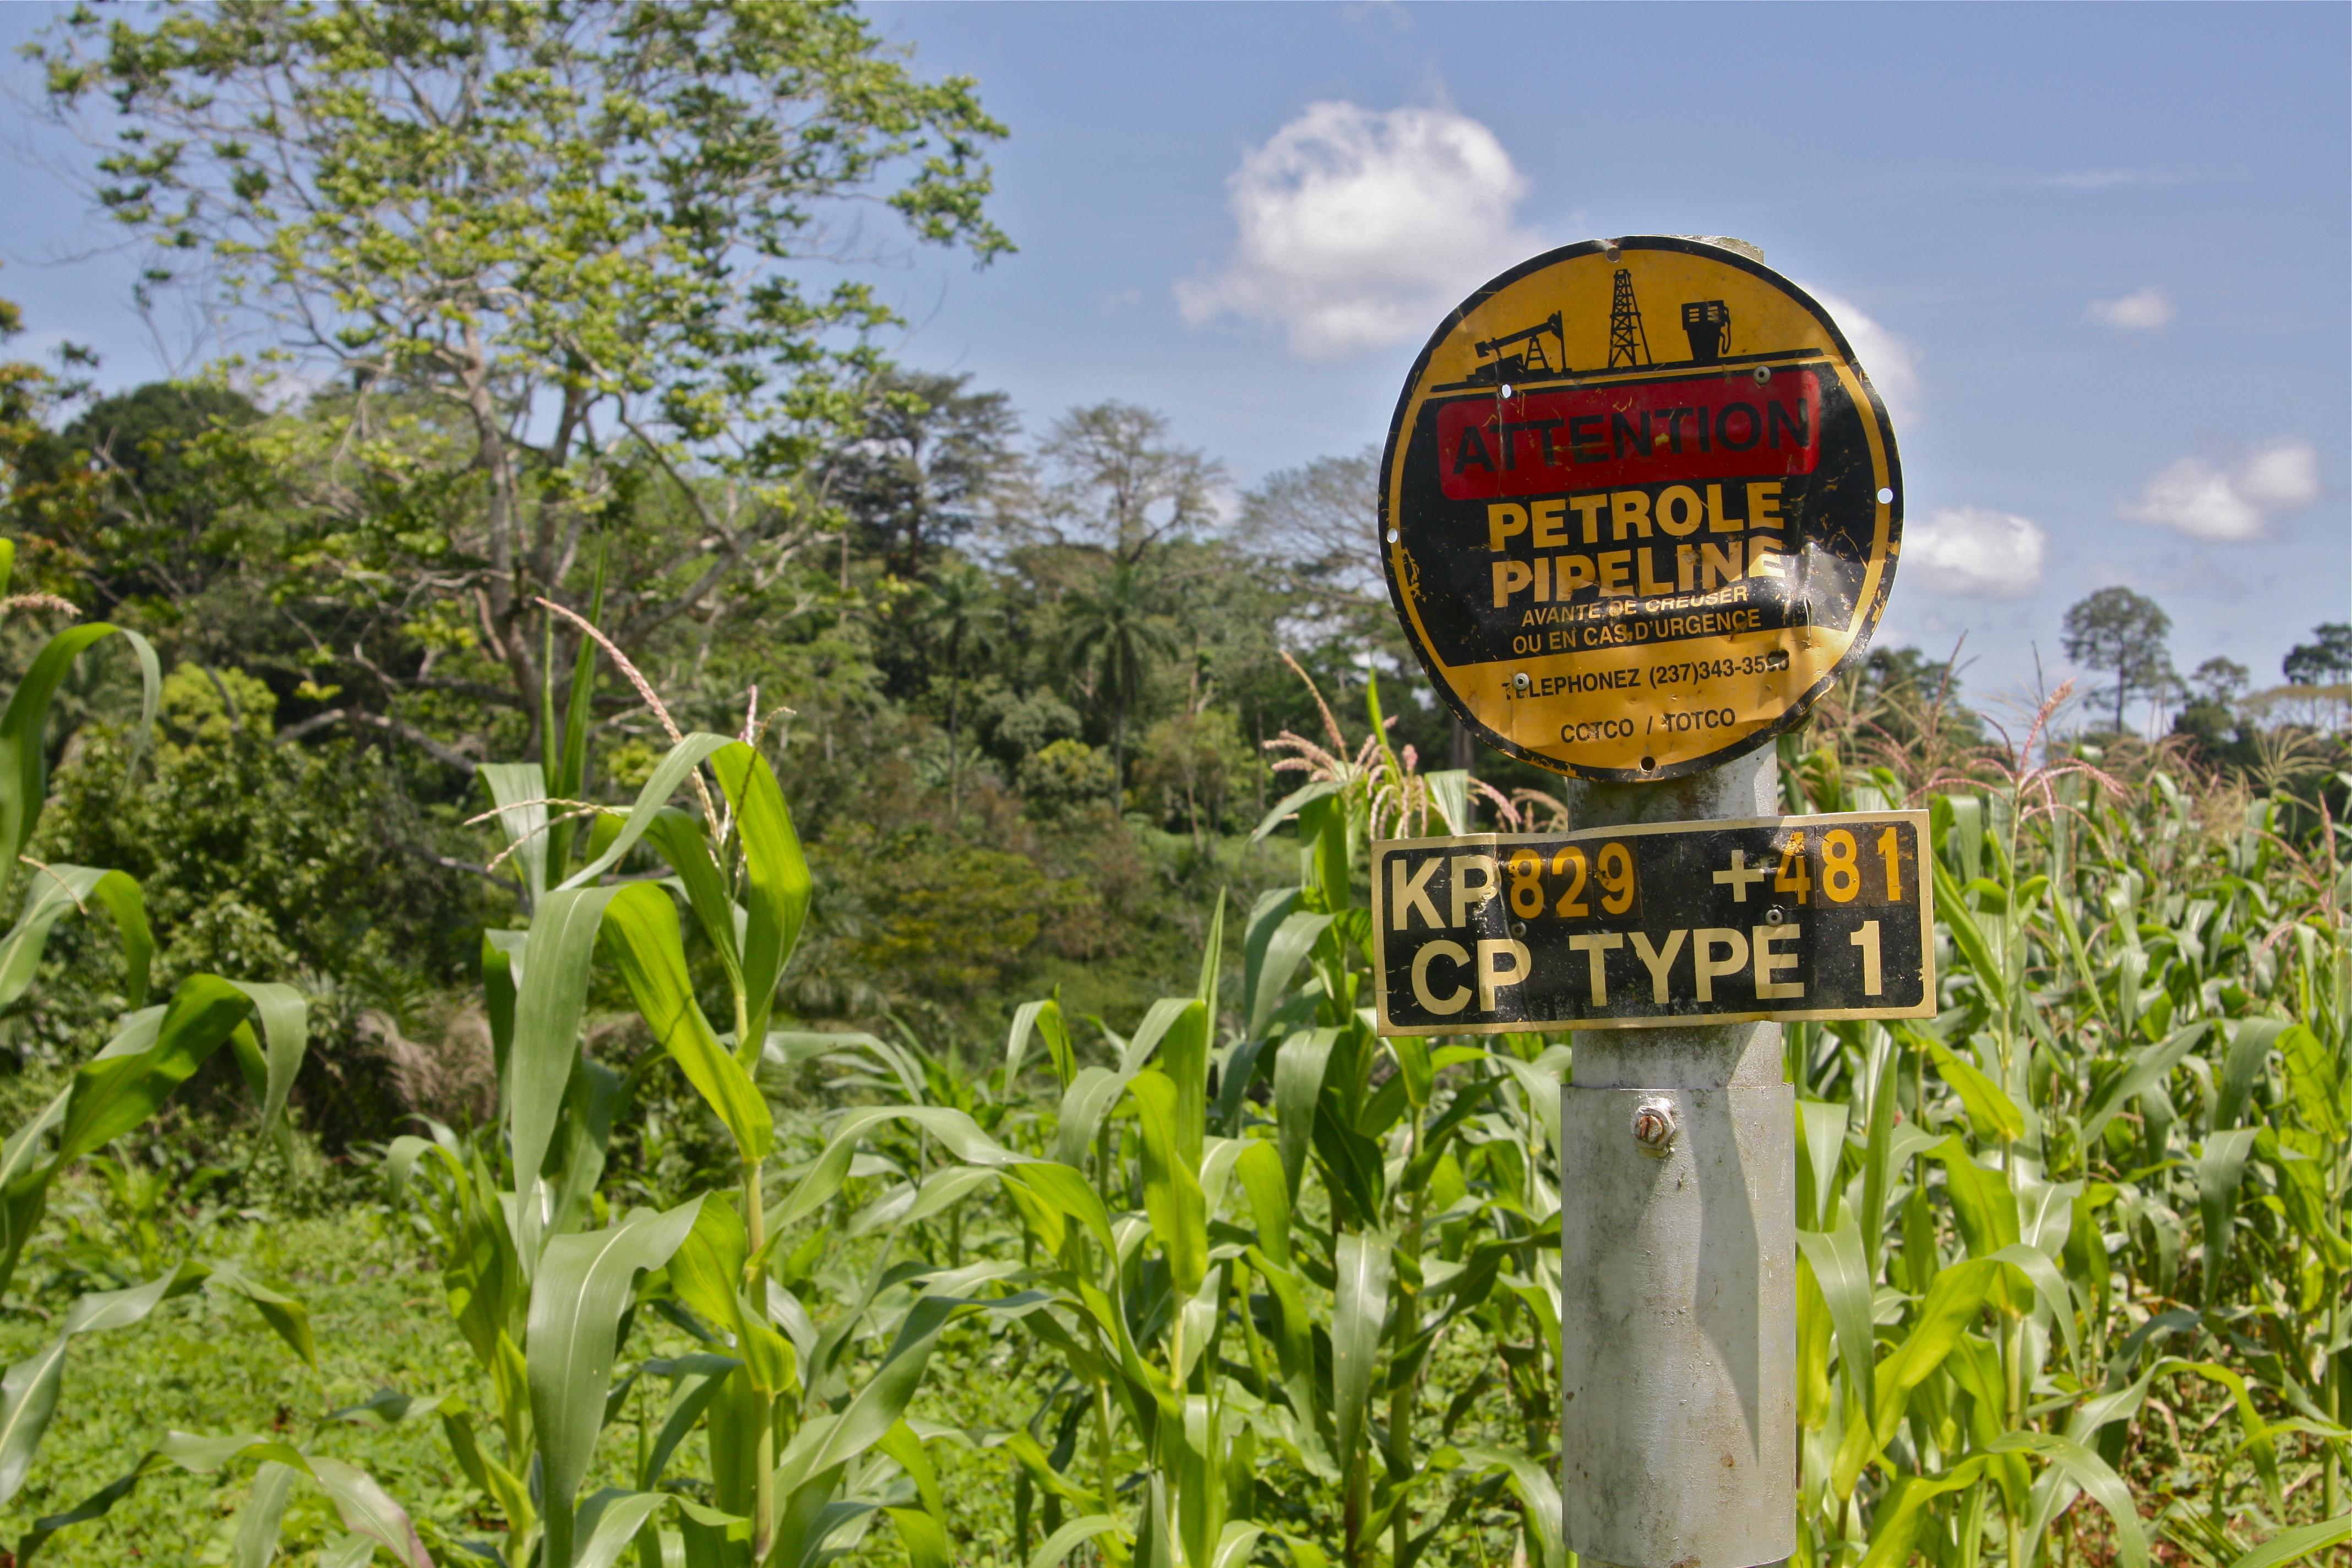 pipeline_cornfield